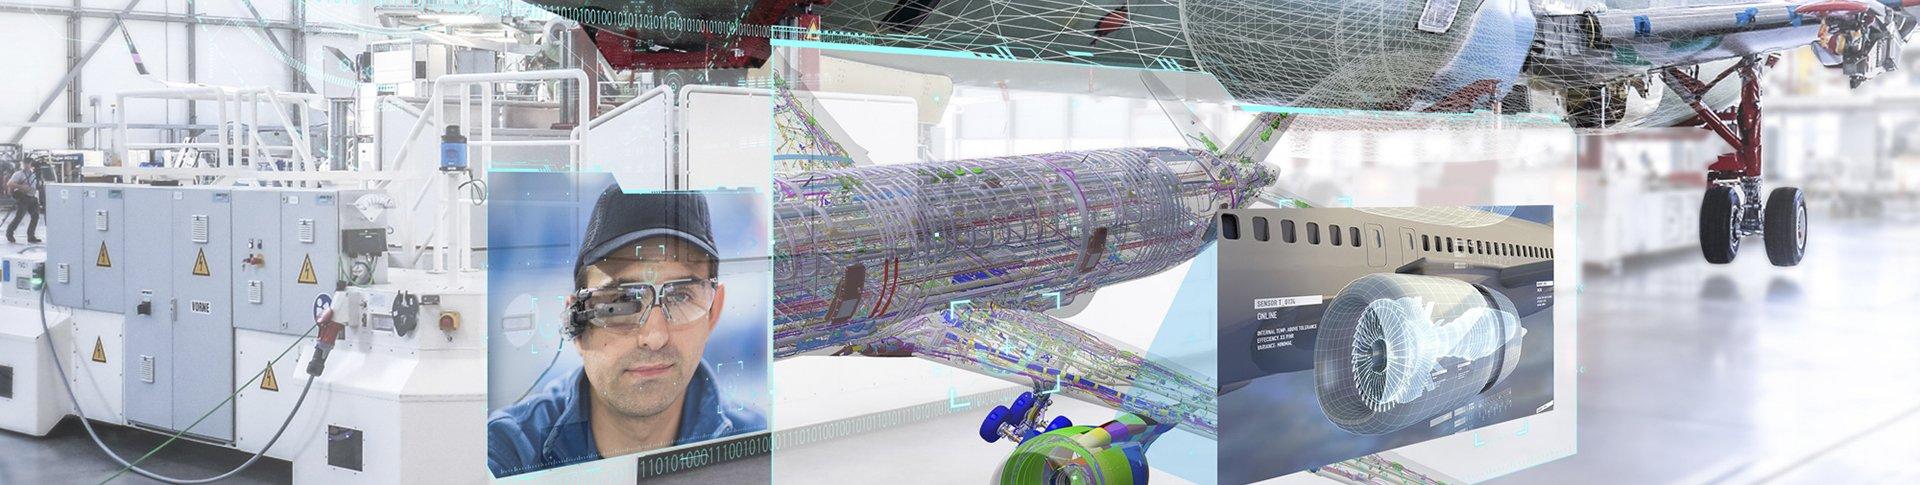 Digital Design, Manufacturing & Services